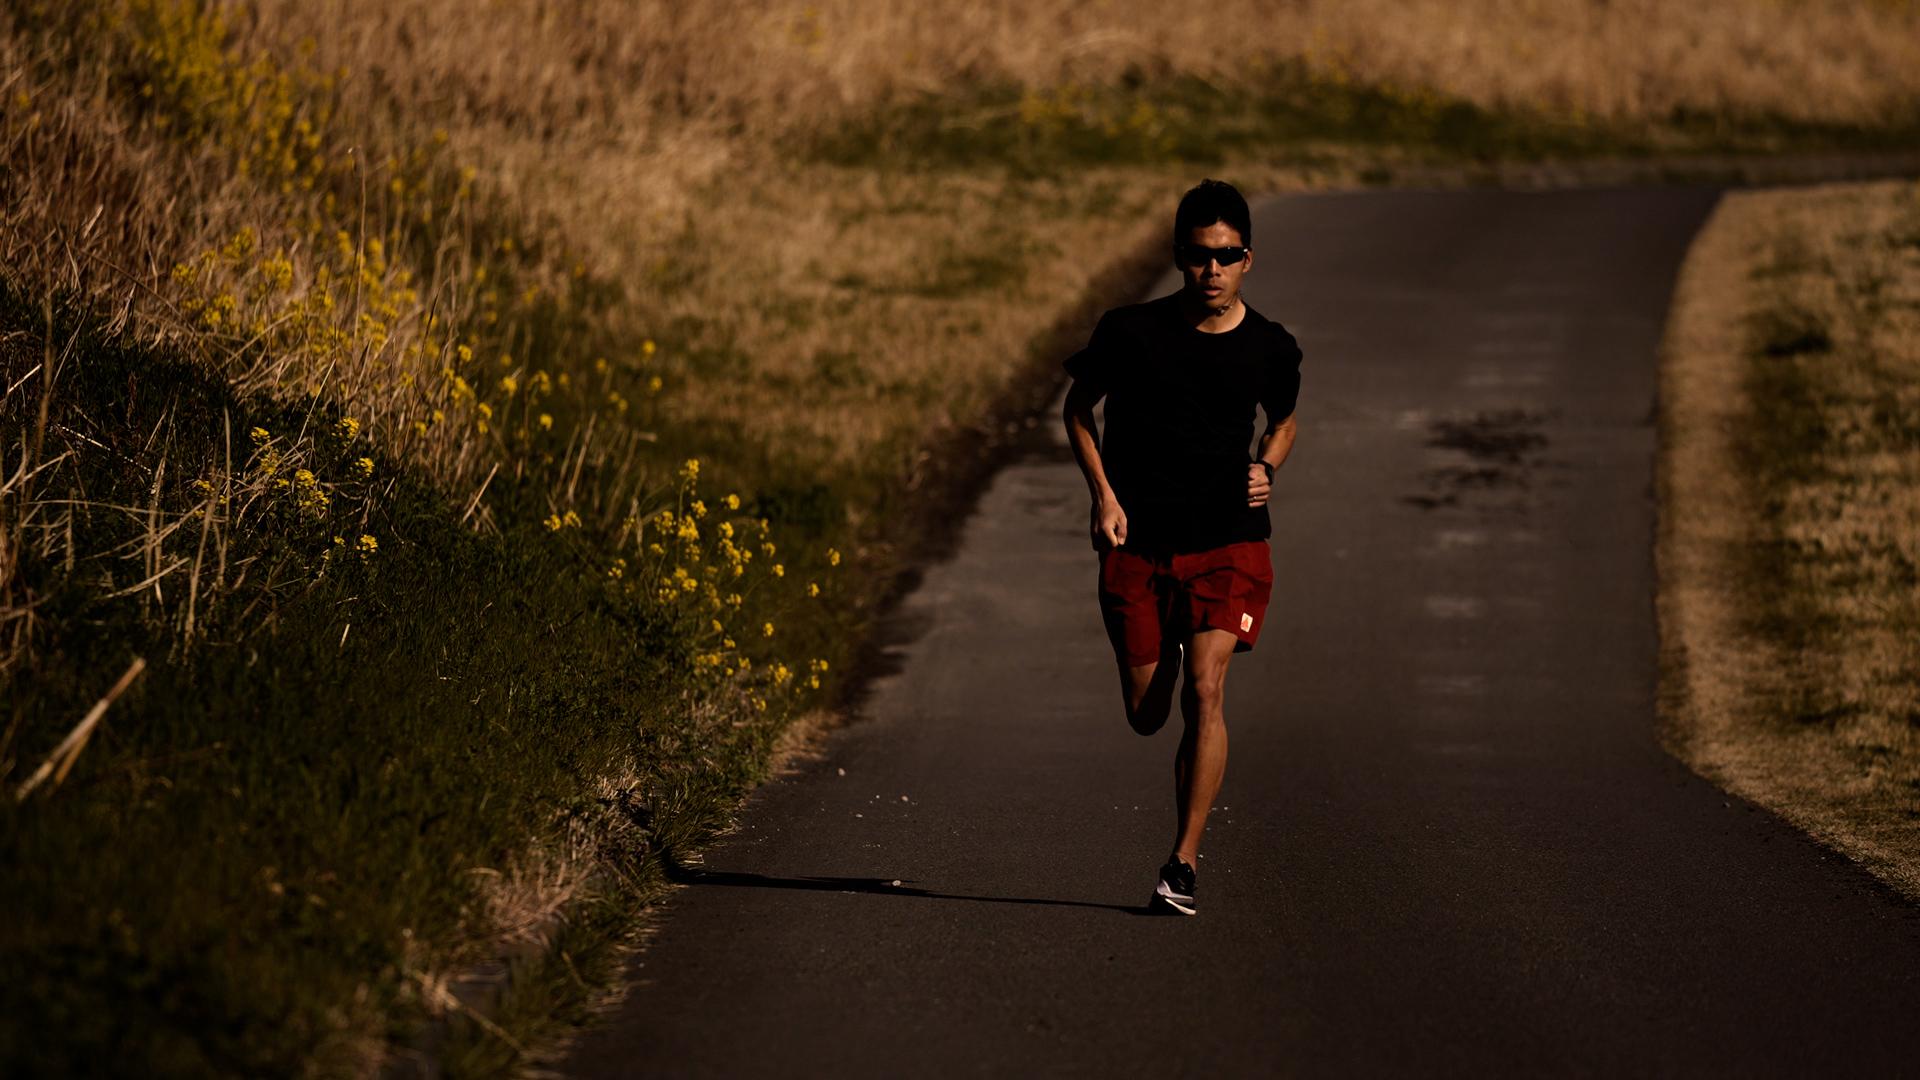 MORNING RUN WITH #002 YUSUKE OGURA